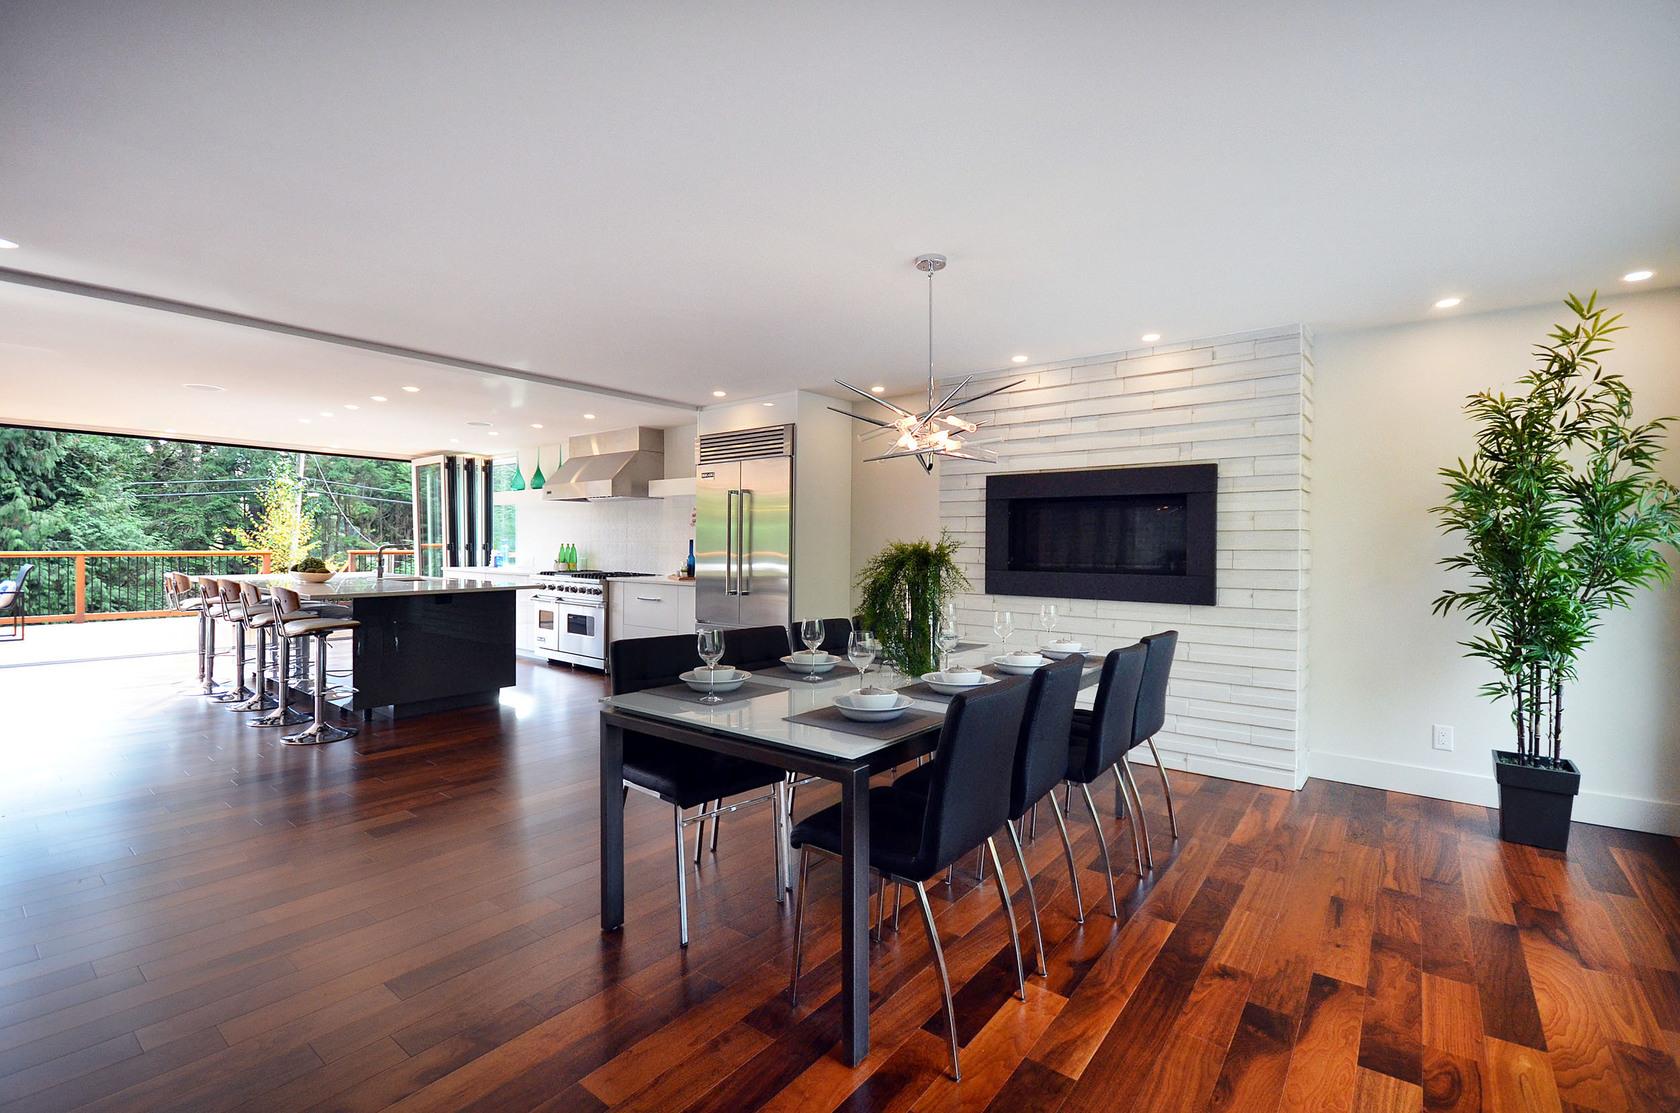 530 Burhill Road, British Properties, West Vancouver